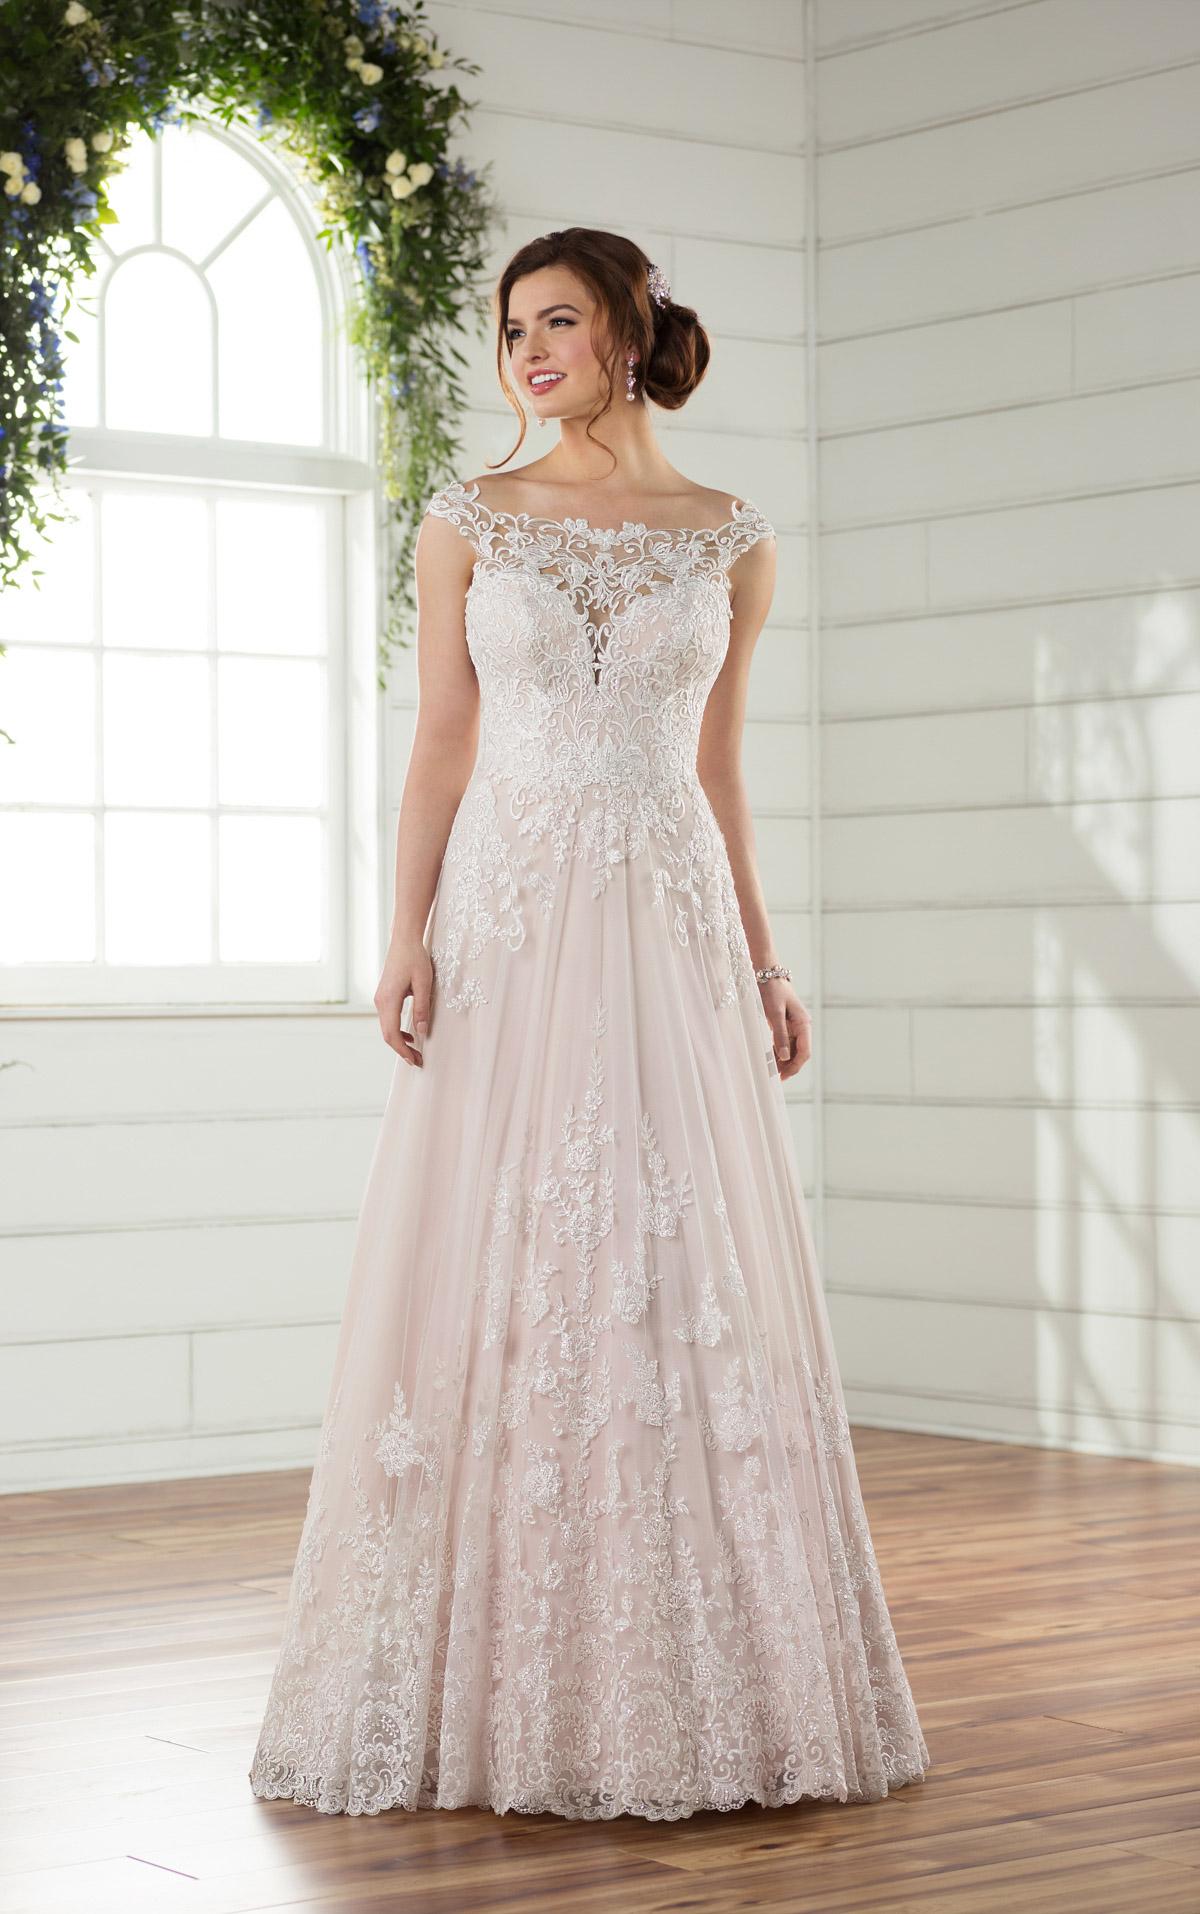 Essense D2327 Lace & Tulle Lustre Satin Wedding Dress sale at £1699